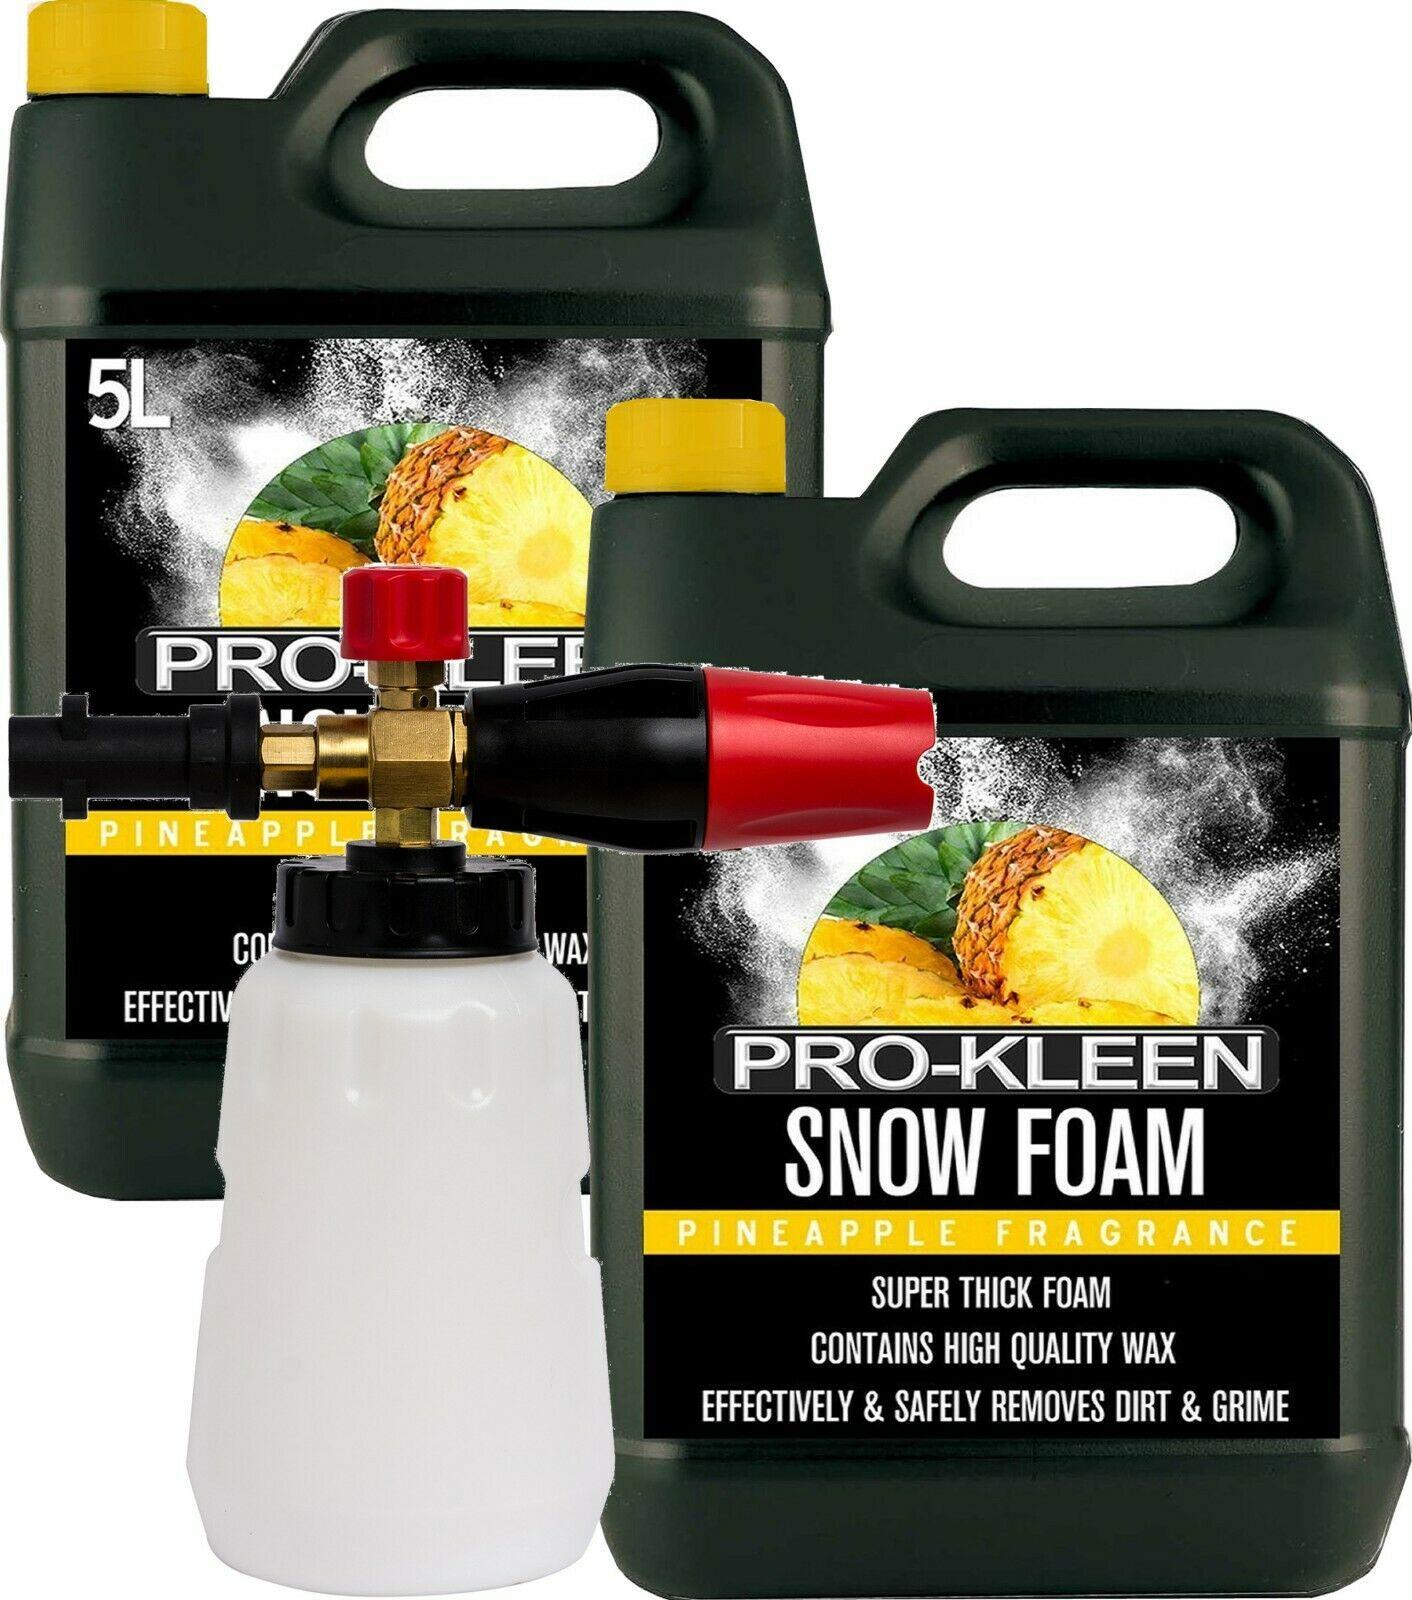 ProKleen Snow Foam Lance Cannon Karcher K Compatible Gun + 2 x 5L Snow Foam @ hsd-online / eBay